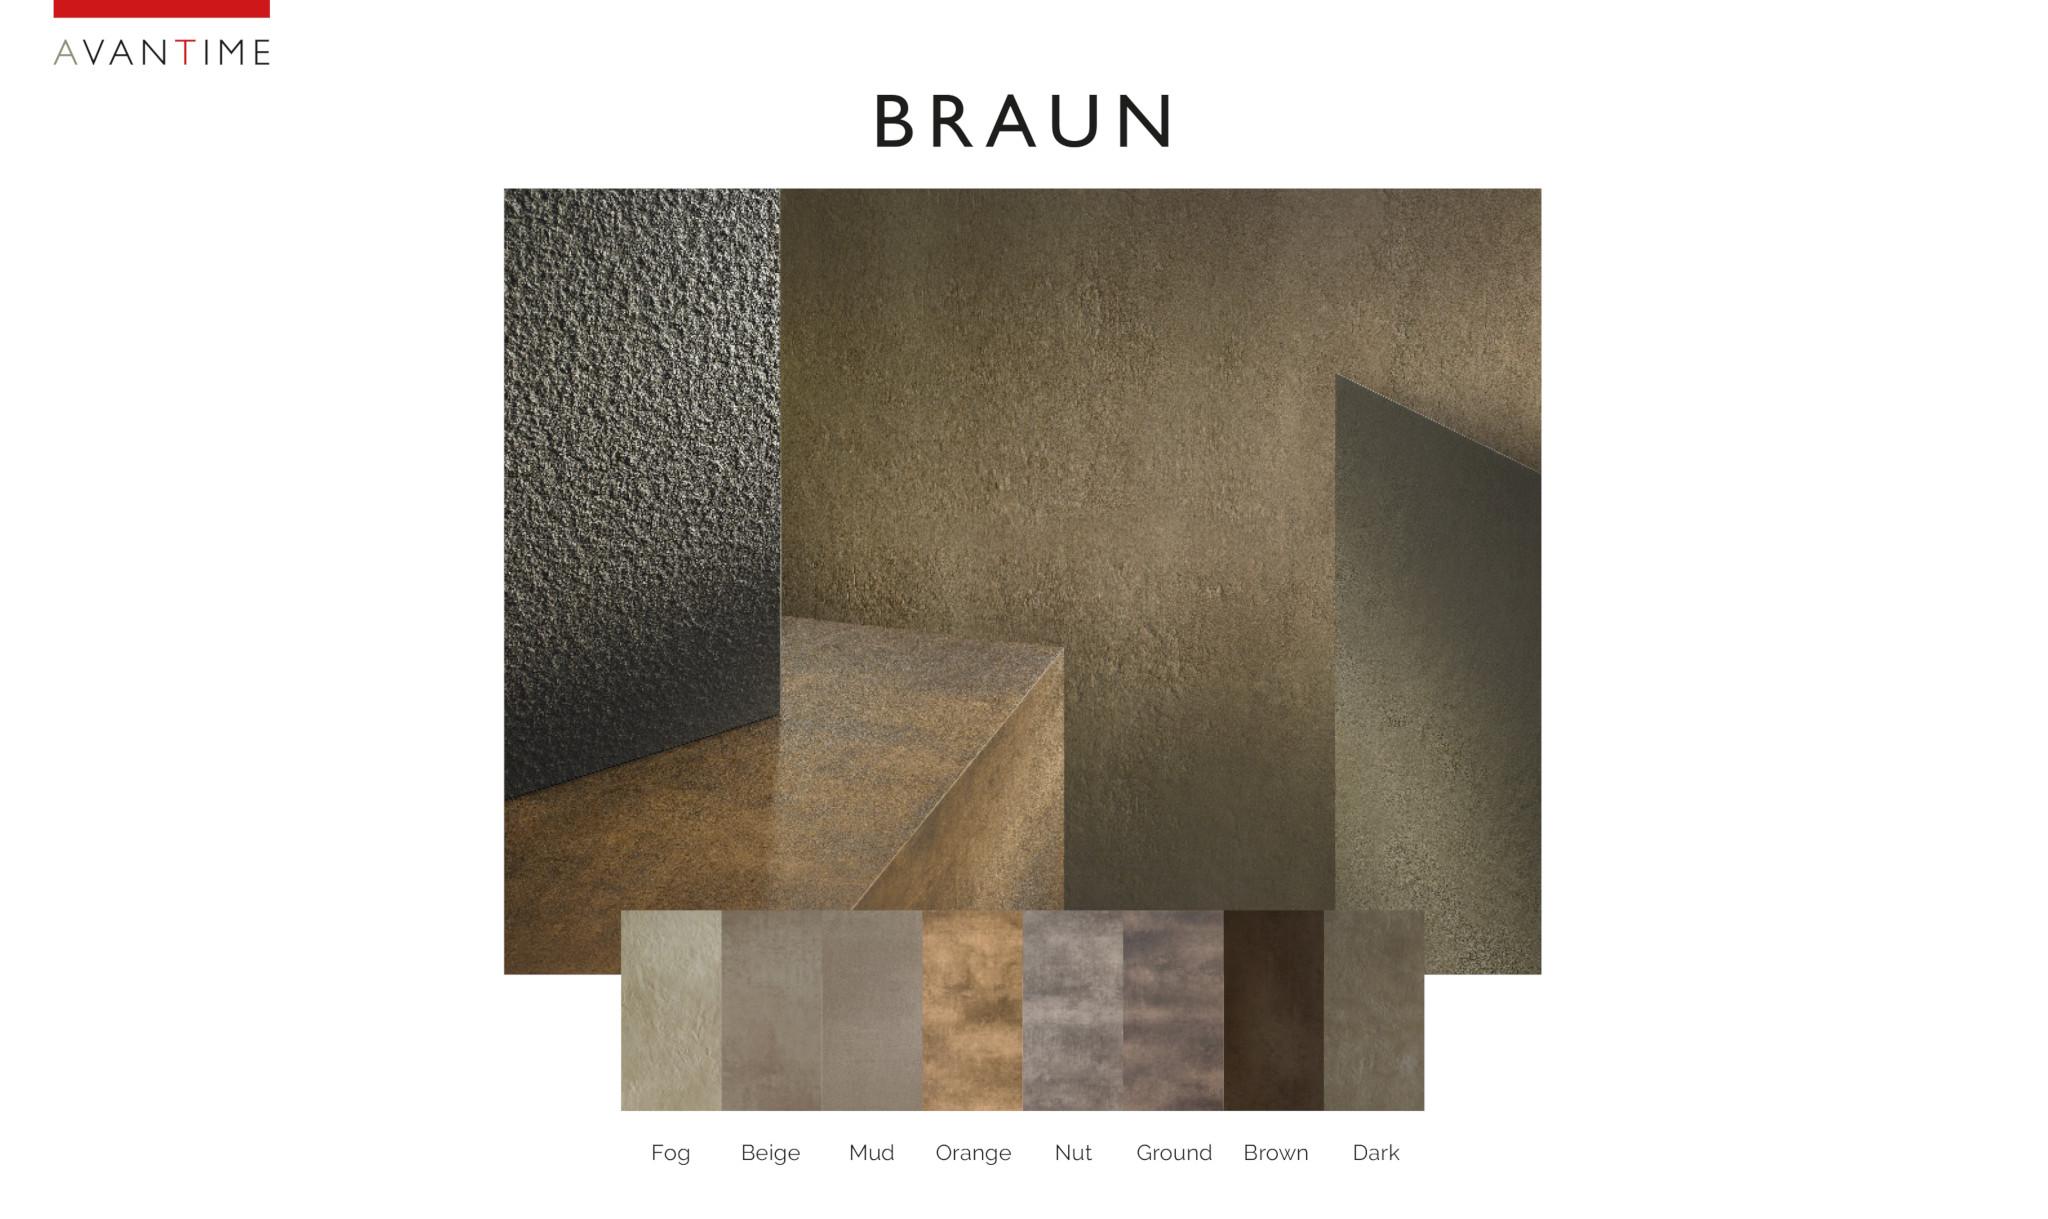 Chromatich Vision - Braun